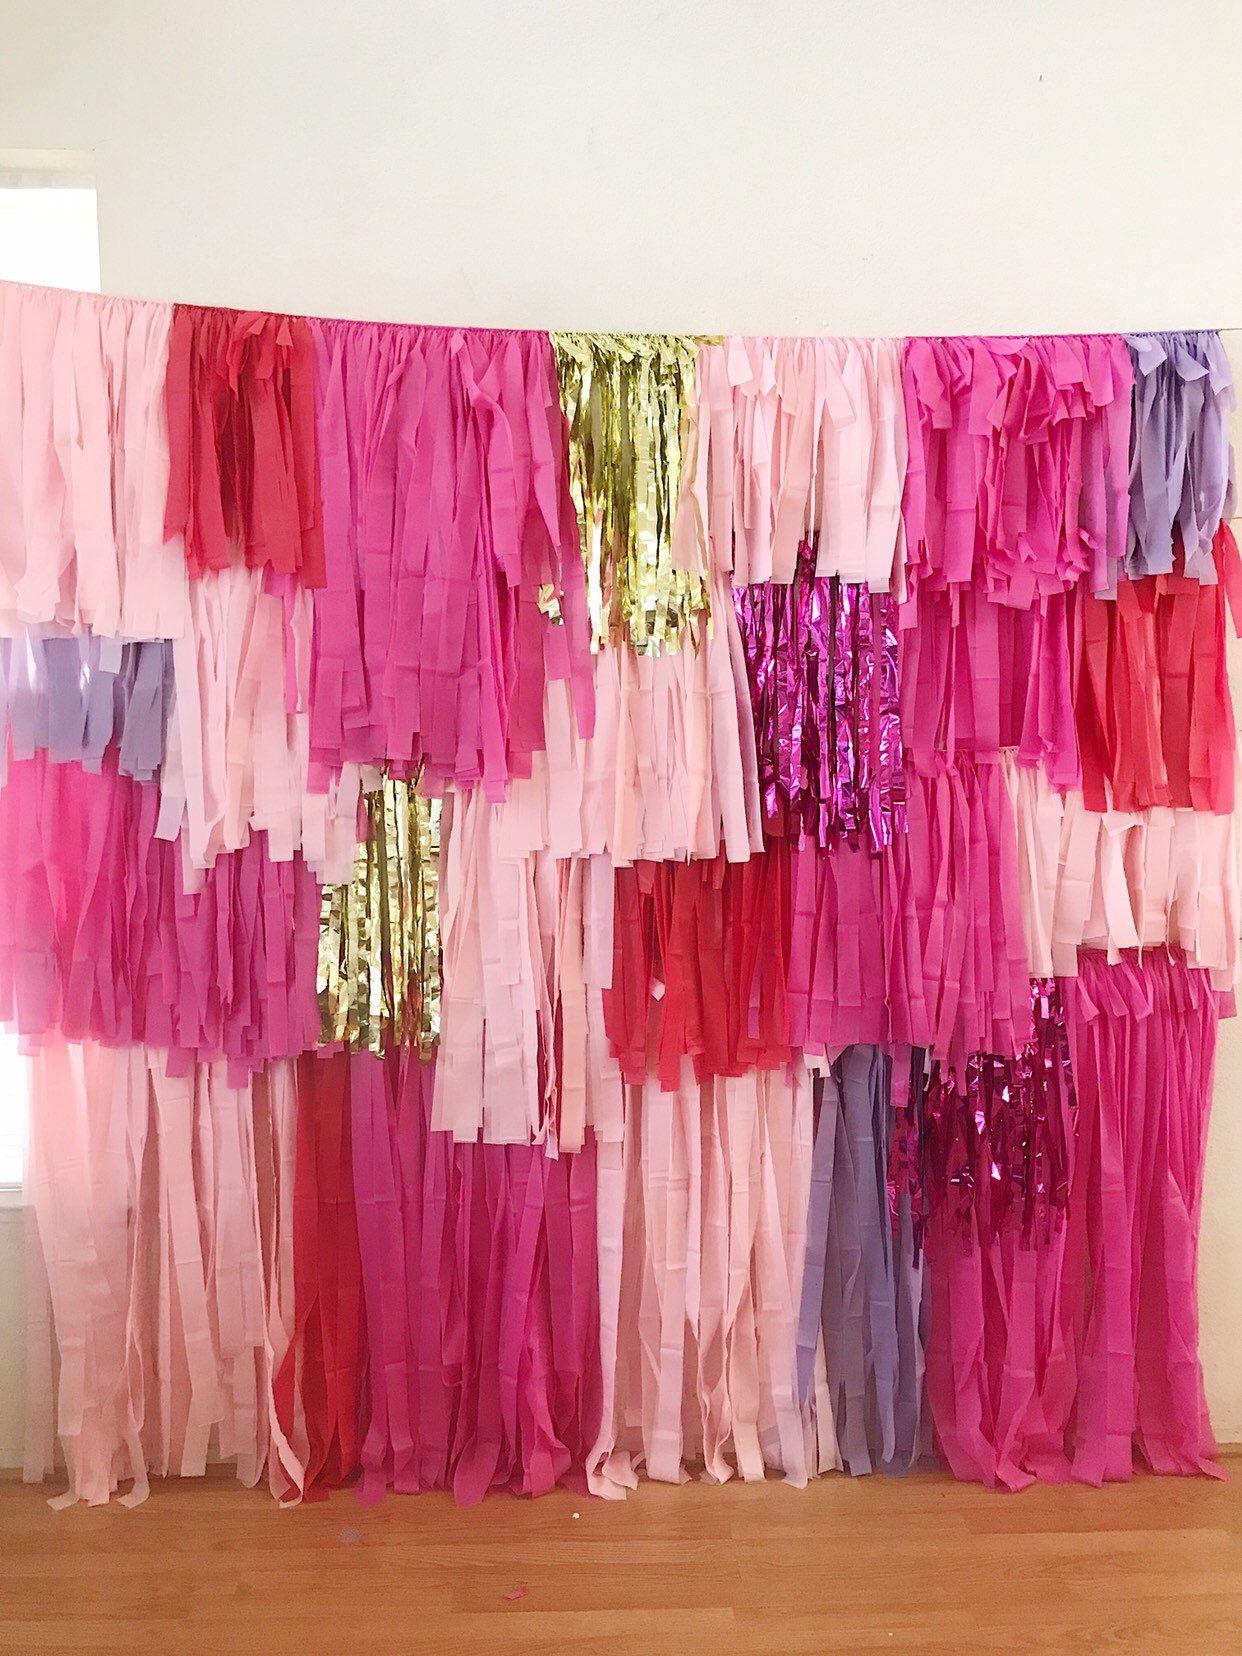 4 Piece Tablecloth Fringe Backdrop Wall, colorblock style, tassel wall, Flagtape Backdrop, streamer wall Fringe Backdrop, Birthday, Party